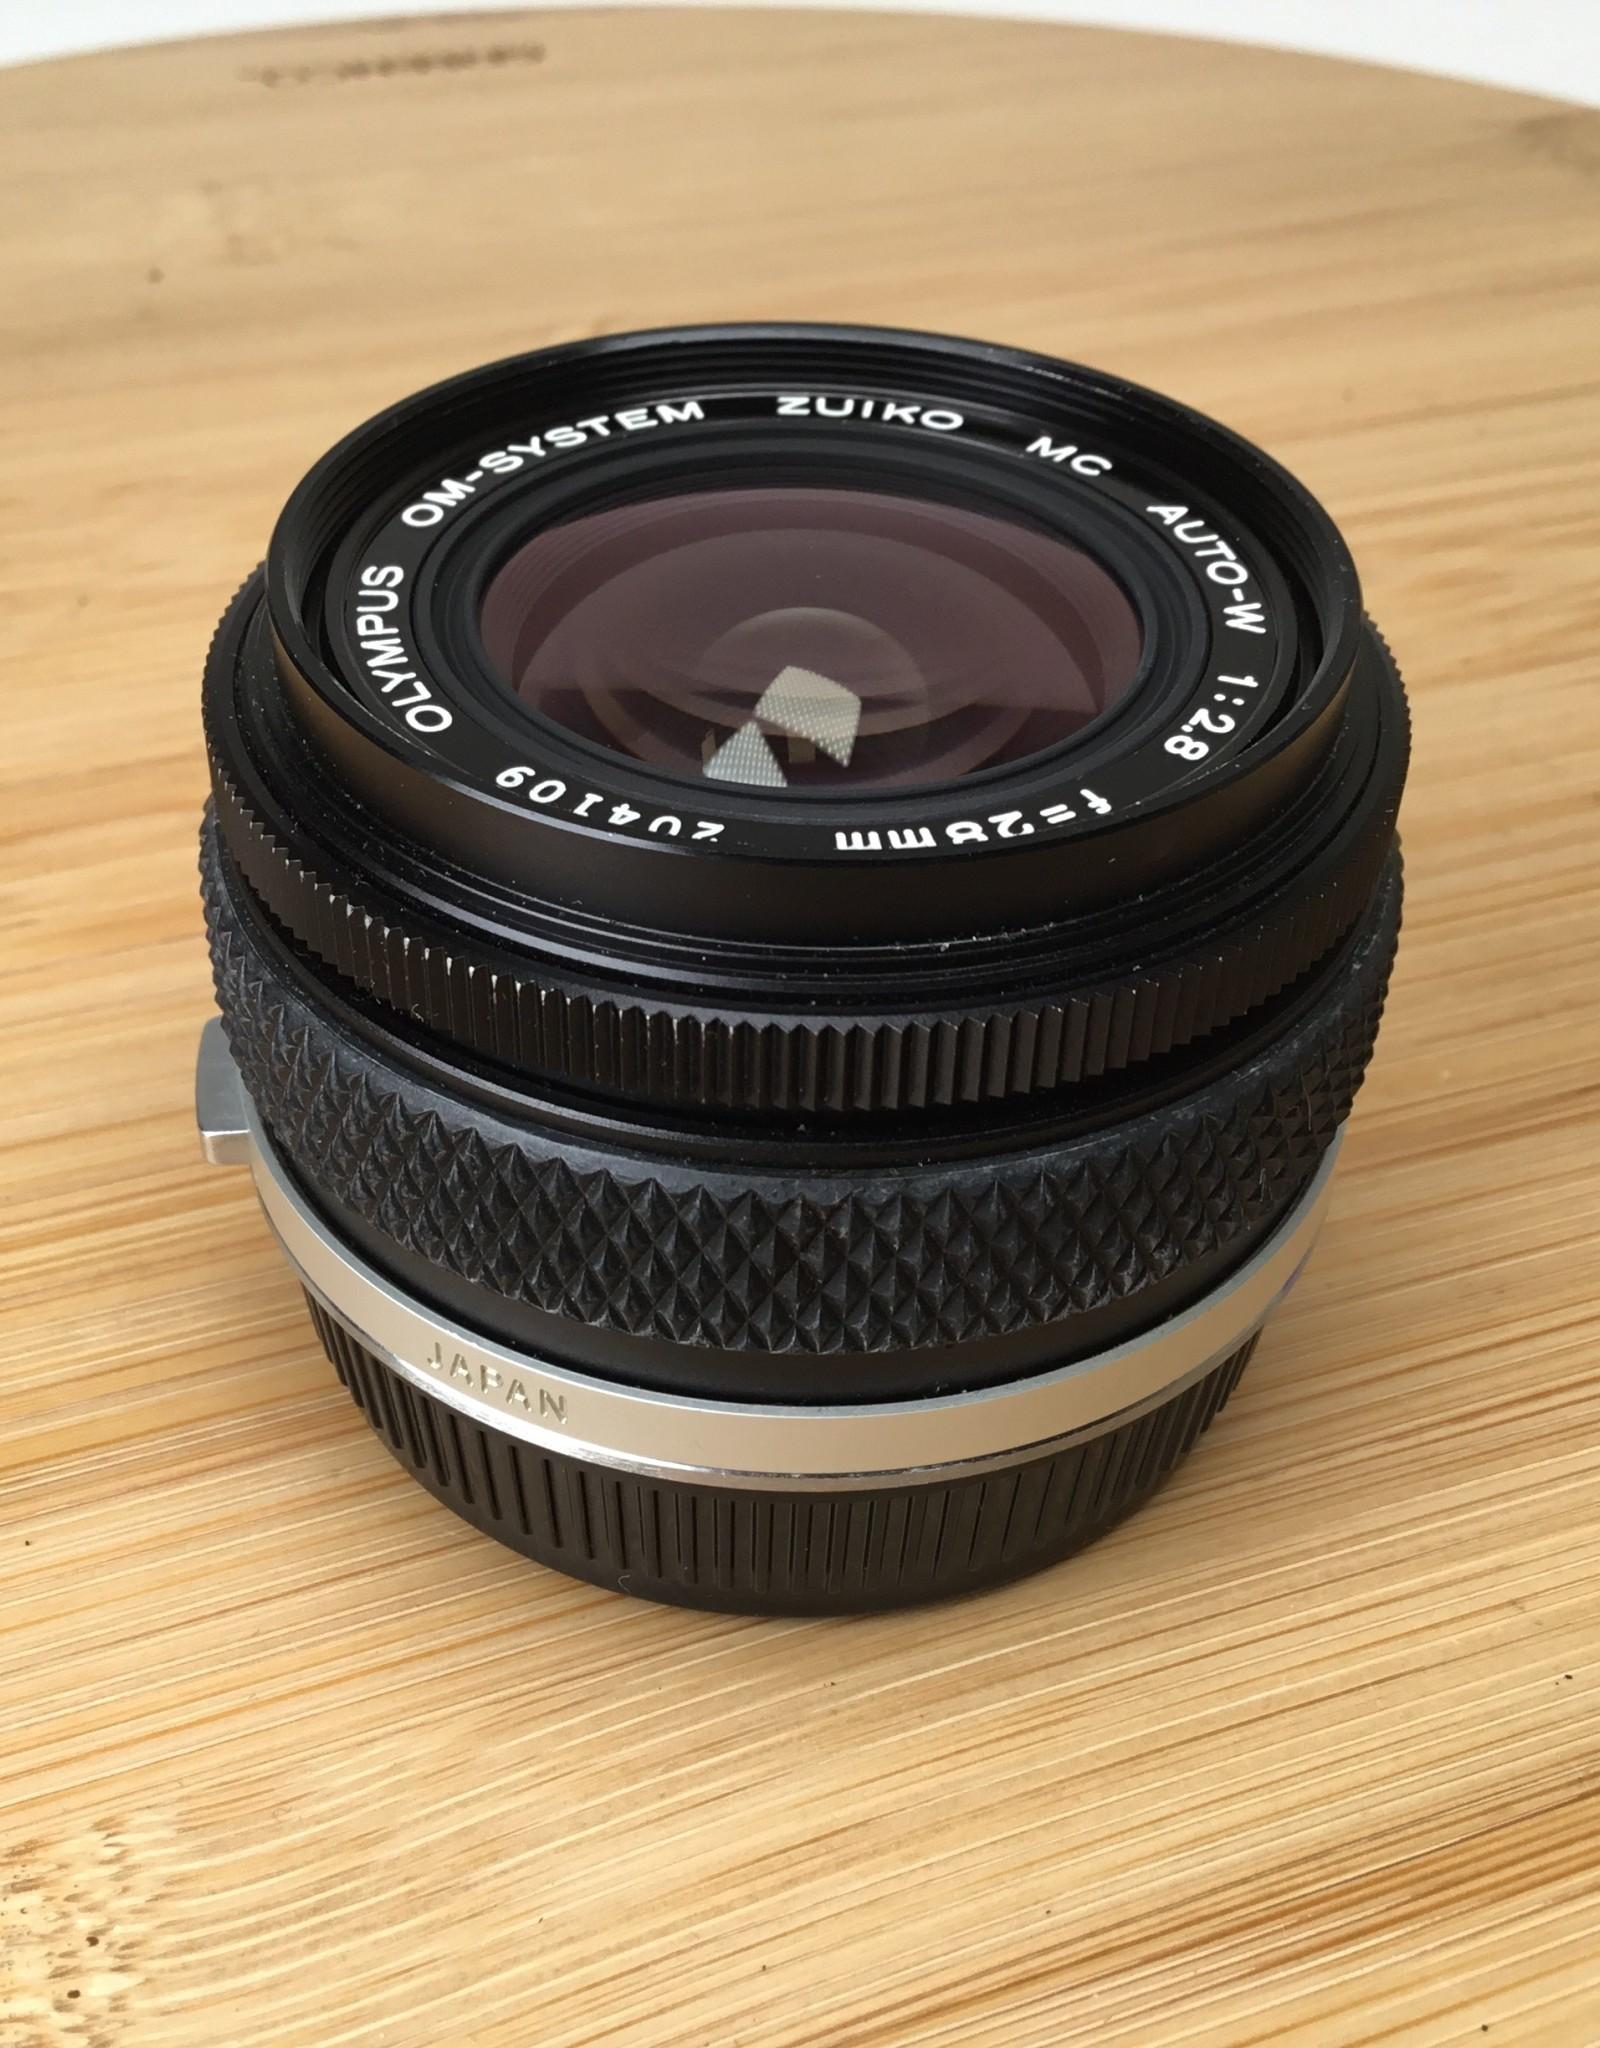 OLYMPUS Olympus OM 28mm f2.8 Zuiko MC Lens in Box EX